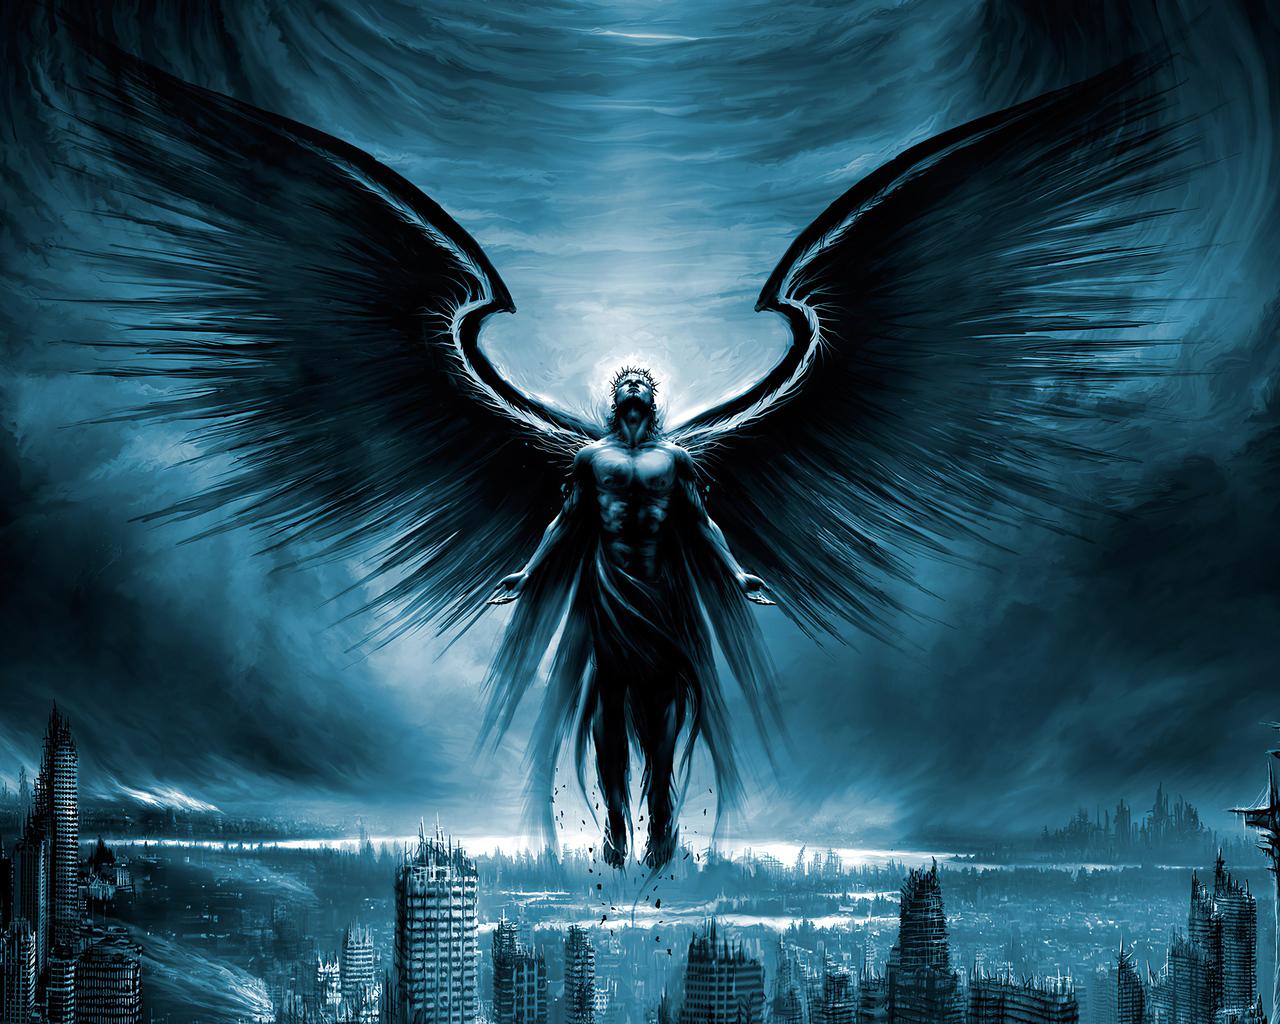 dark-angels-guru-4k-wu.jpg